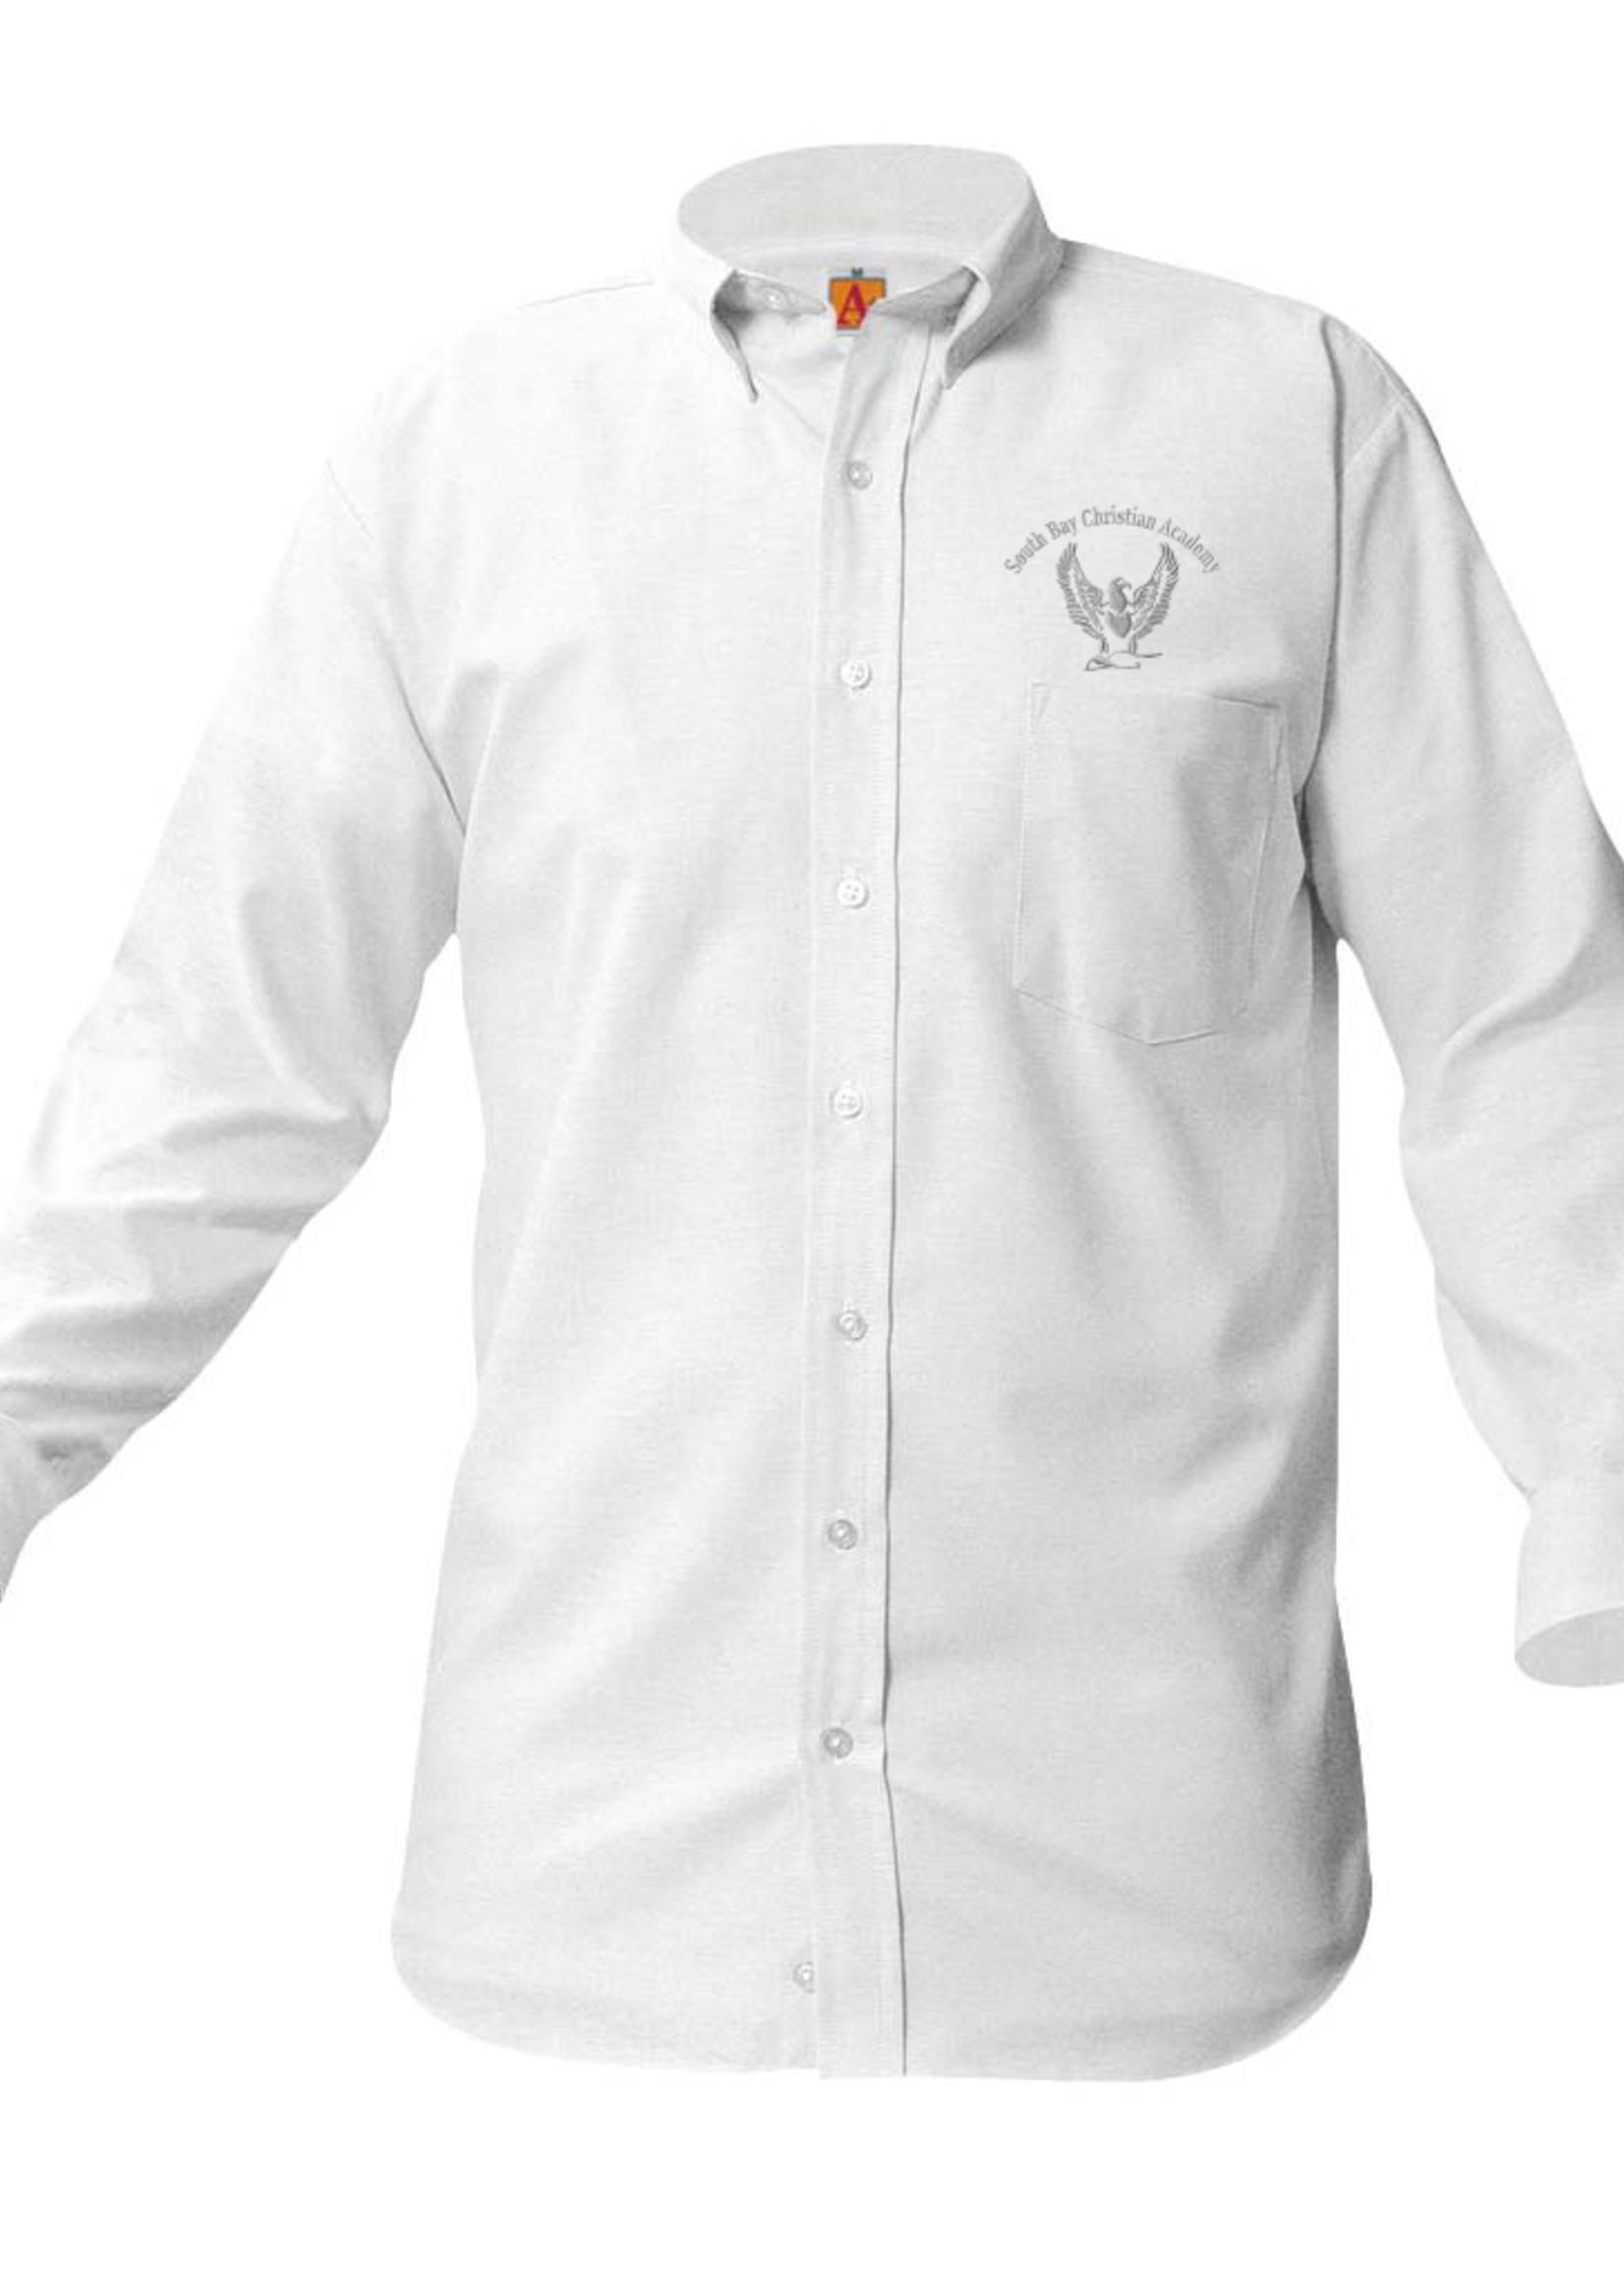 Null SBCA White Long Sleeve Oxford Shirt (G712)